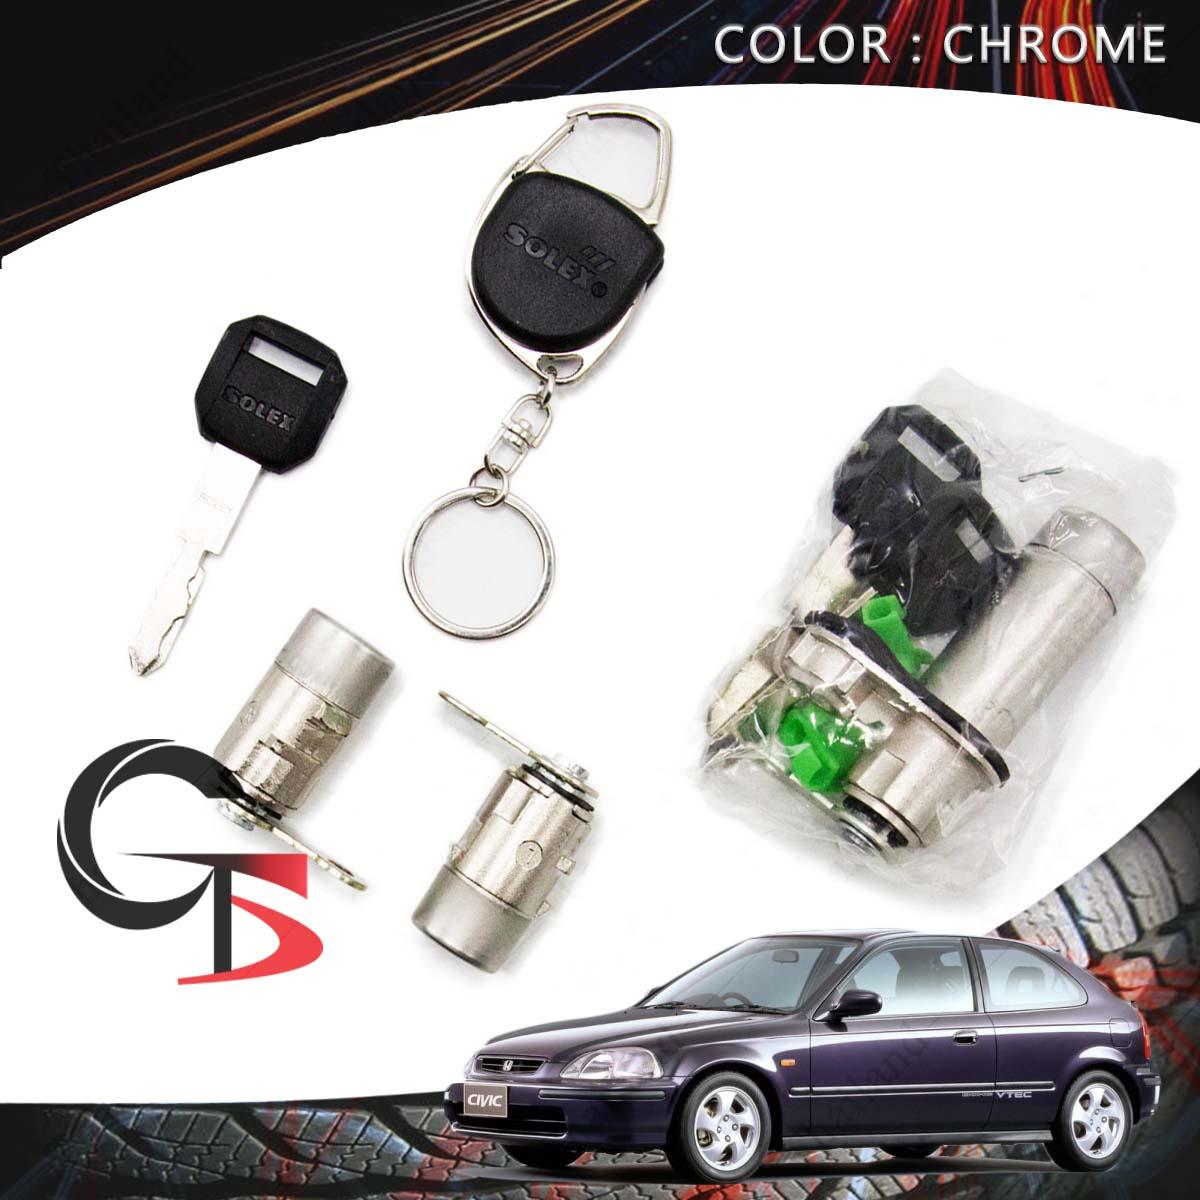 Solex Door Trunk Lock Safety Flat Key Cylinder For Honda Civic 1992-2000